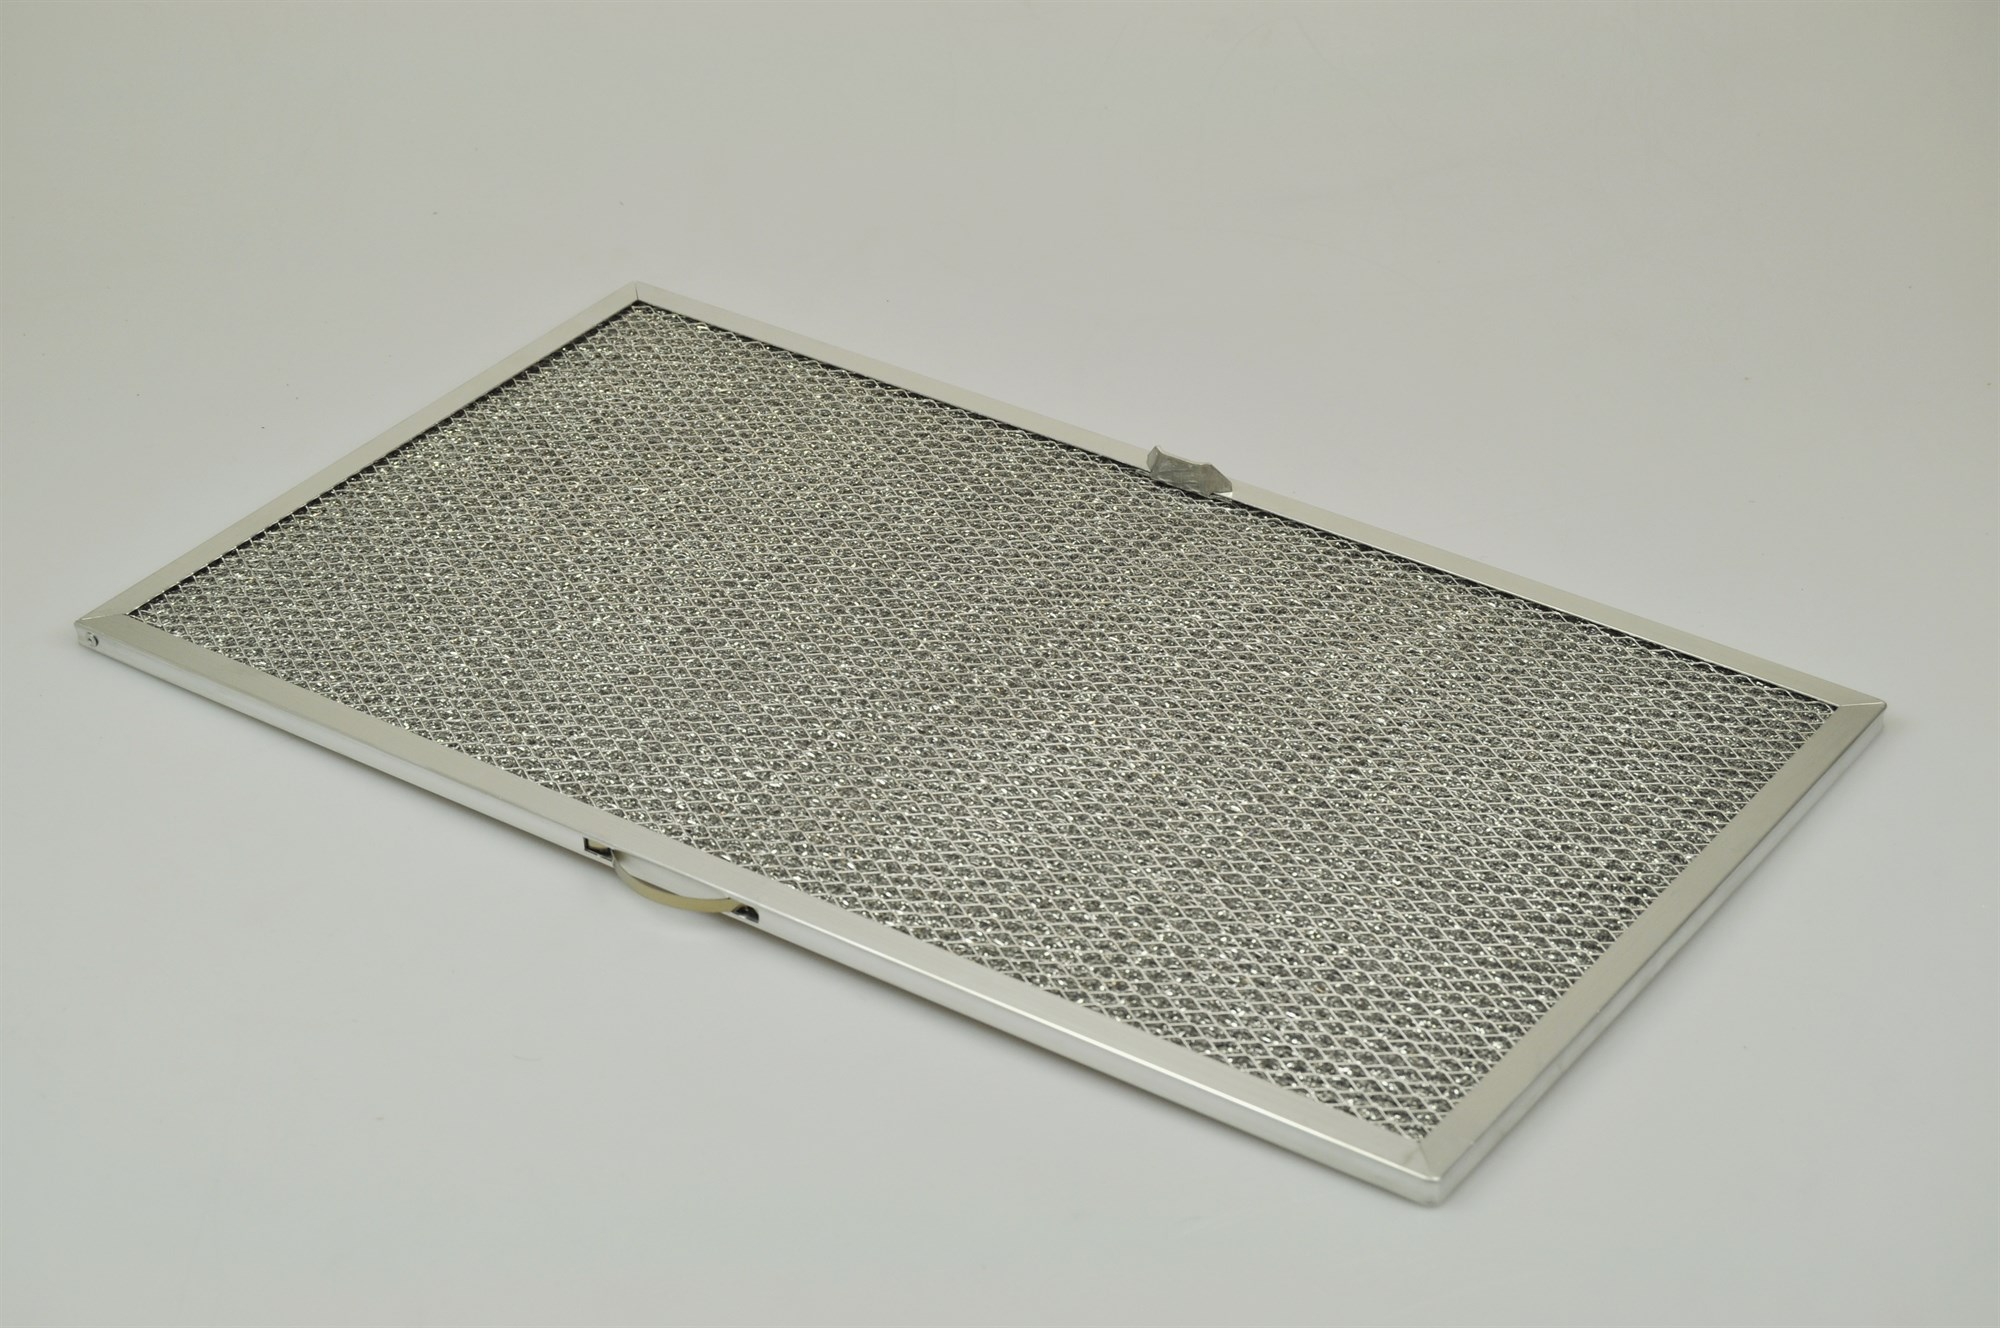 Metallfilter elektro helios dunstabzugshaube aluminium